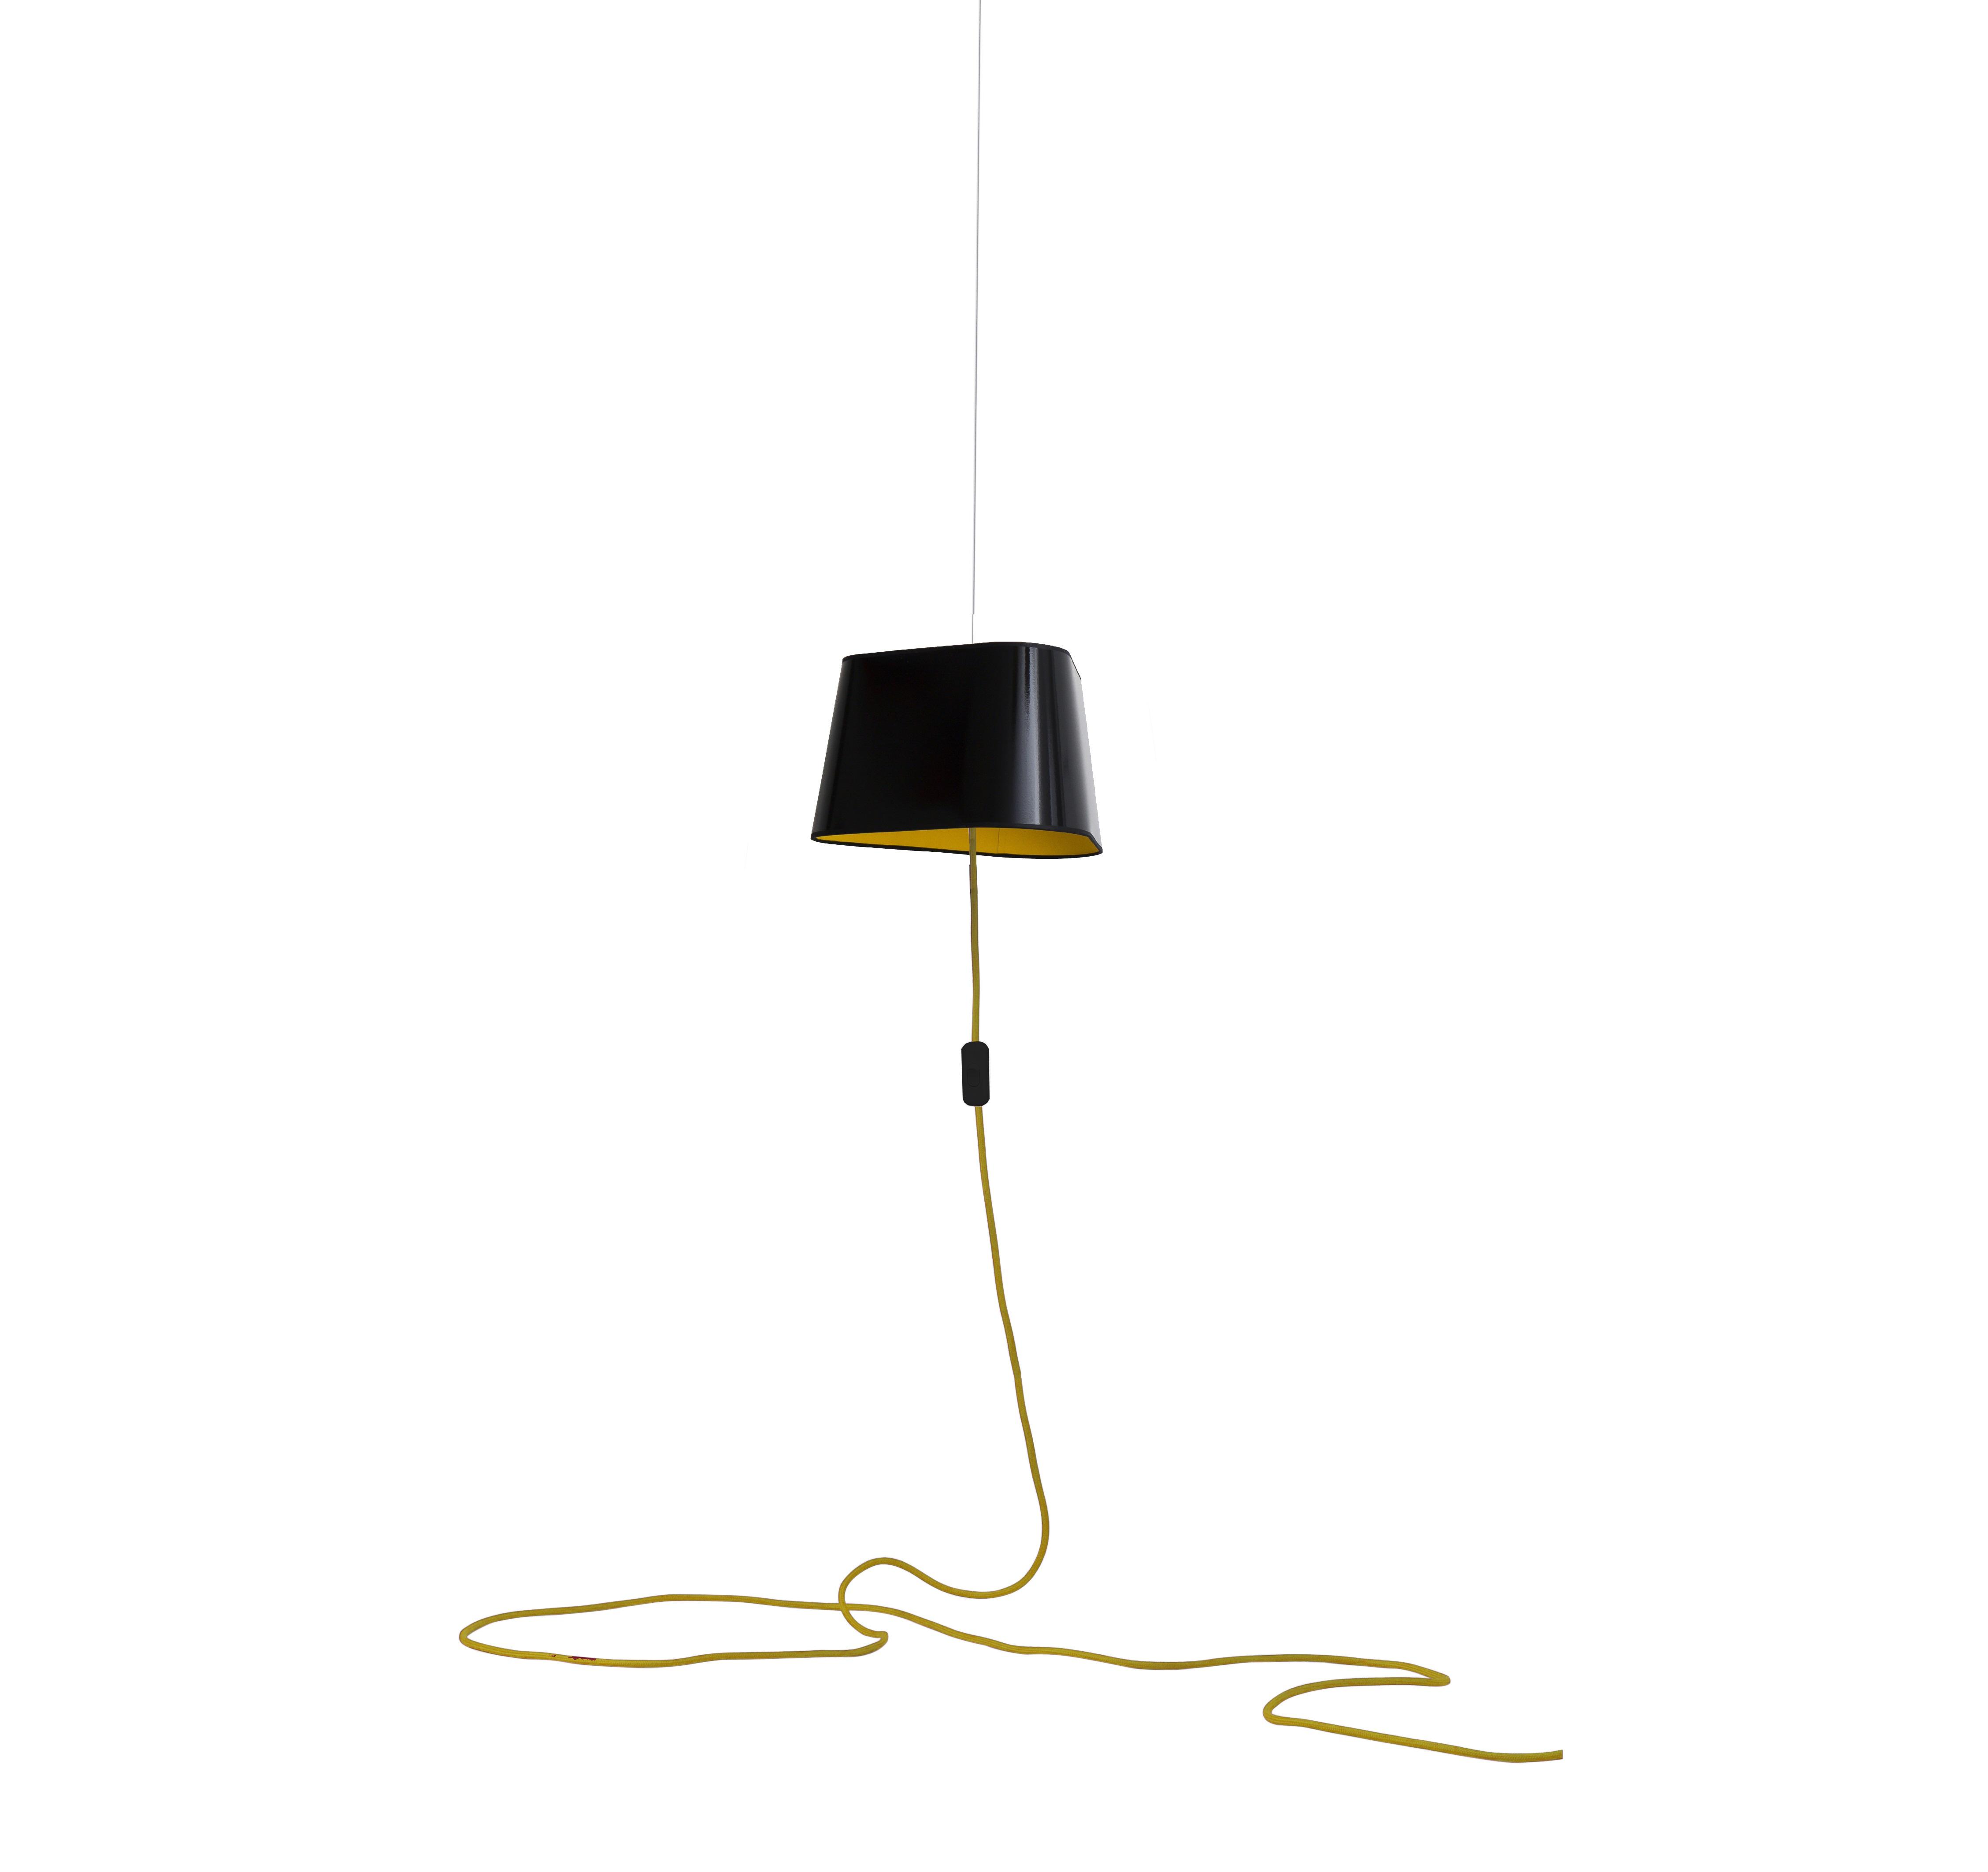 suspension nomade petit nuage noir jaune 24cm. Black Bedroom Furniture Sets. Home Design Ideas